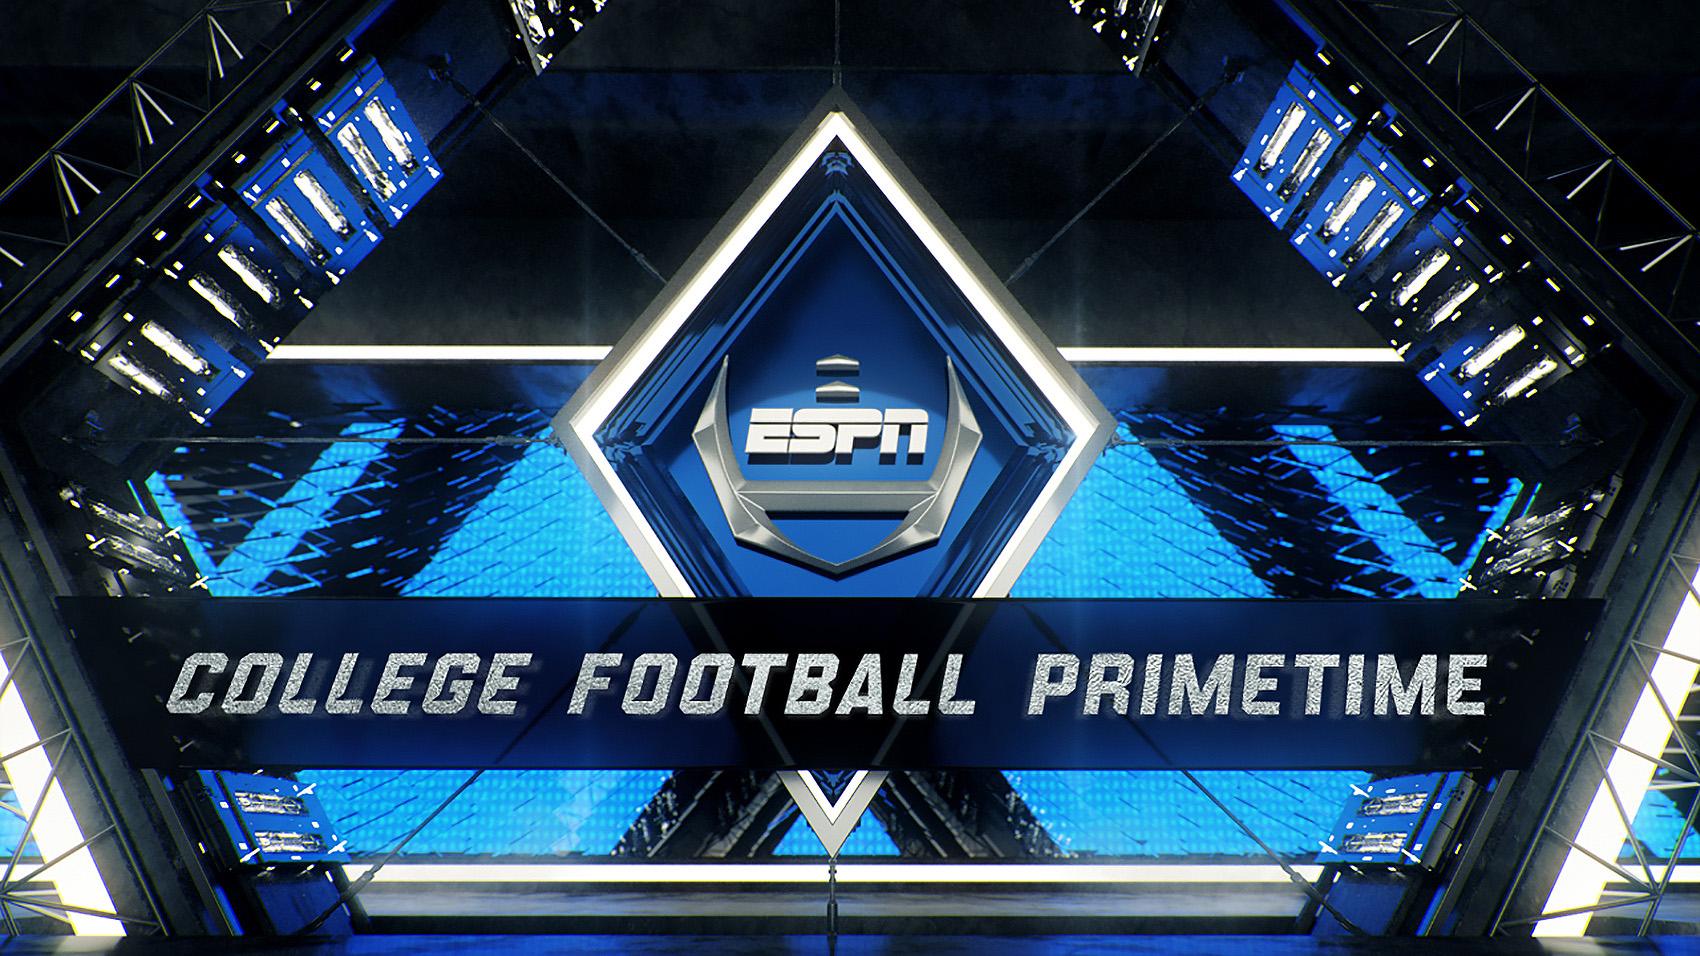 NCS_ESPN-College-Football-Broadcast-Design_0007